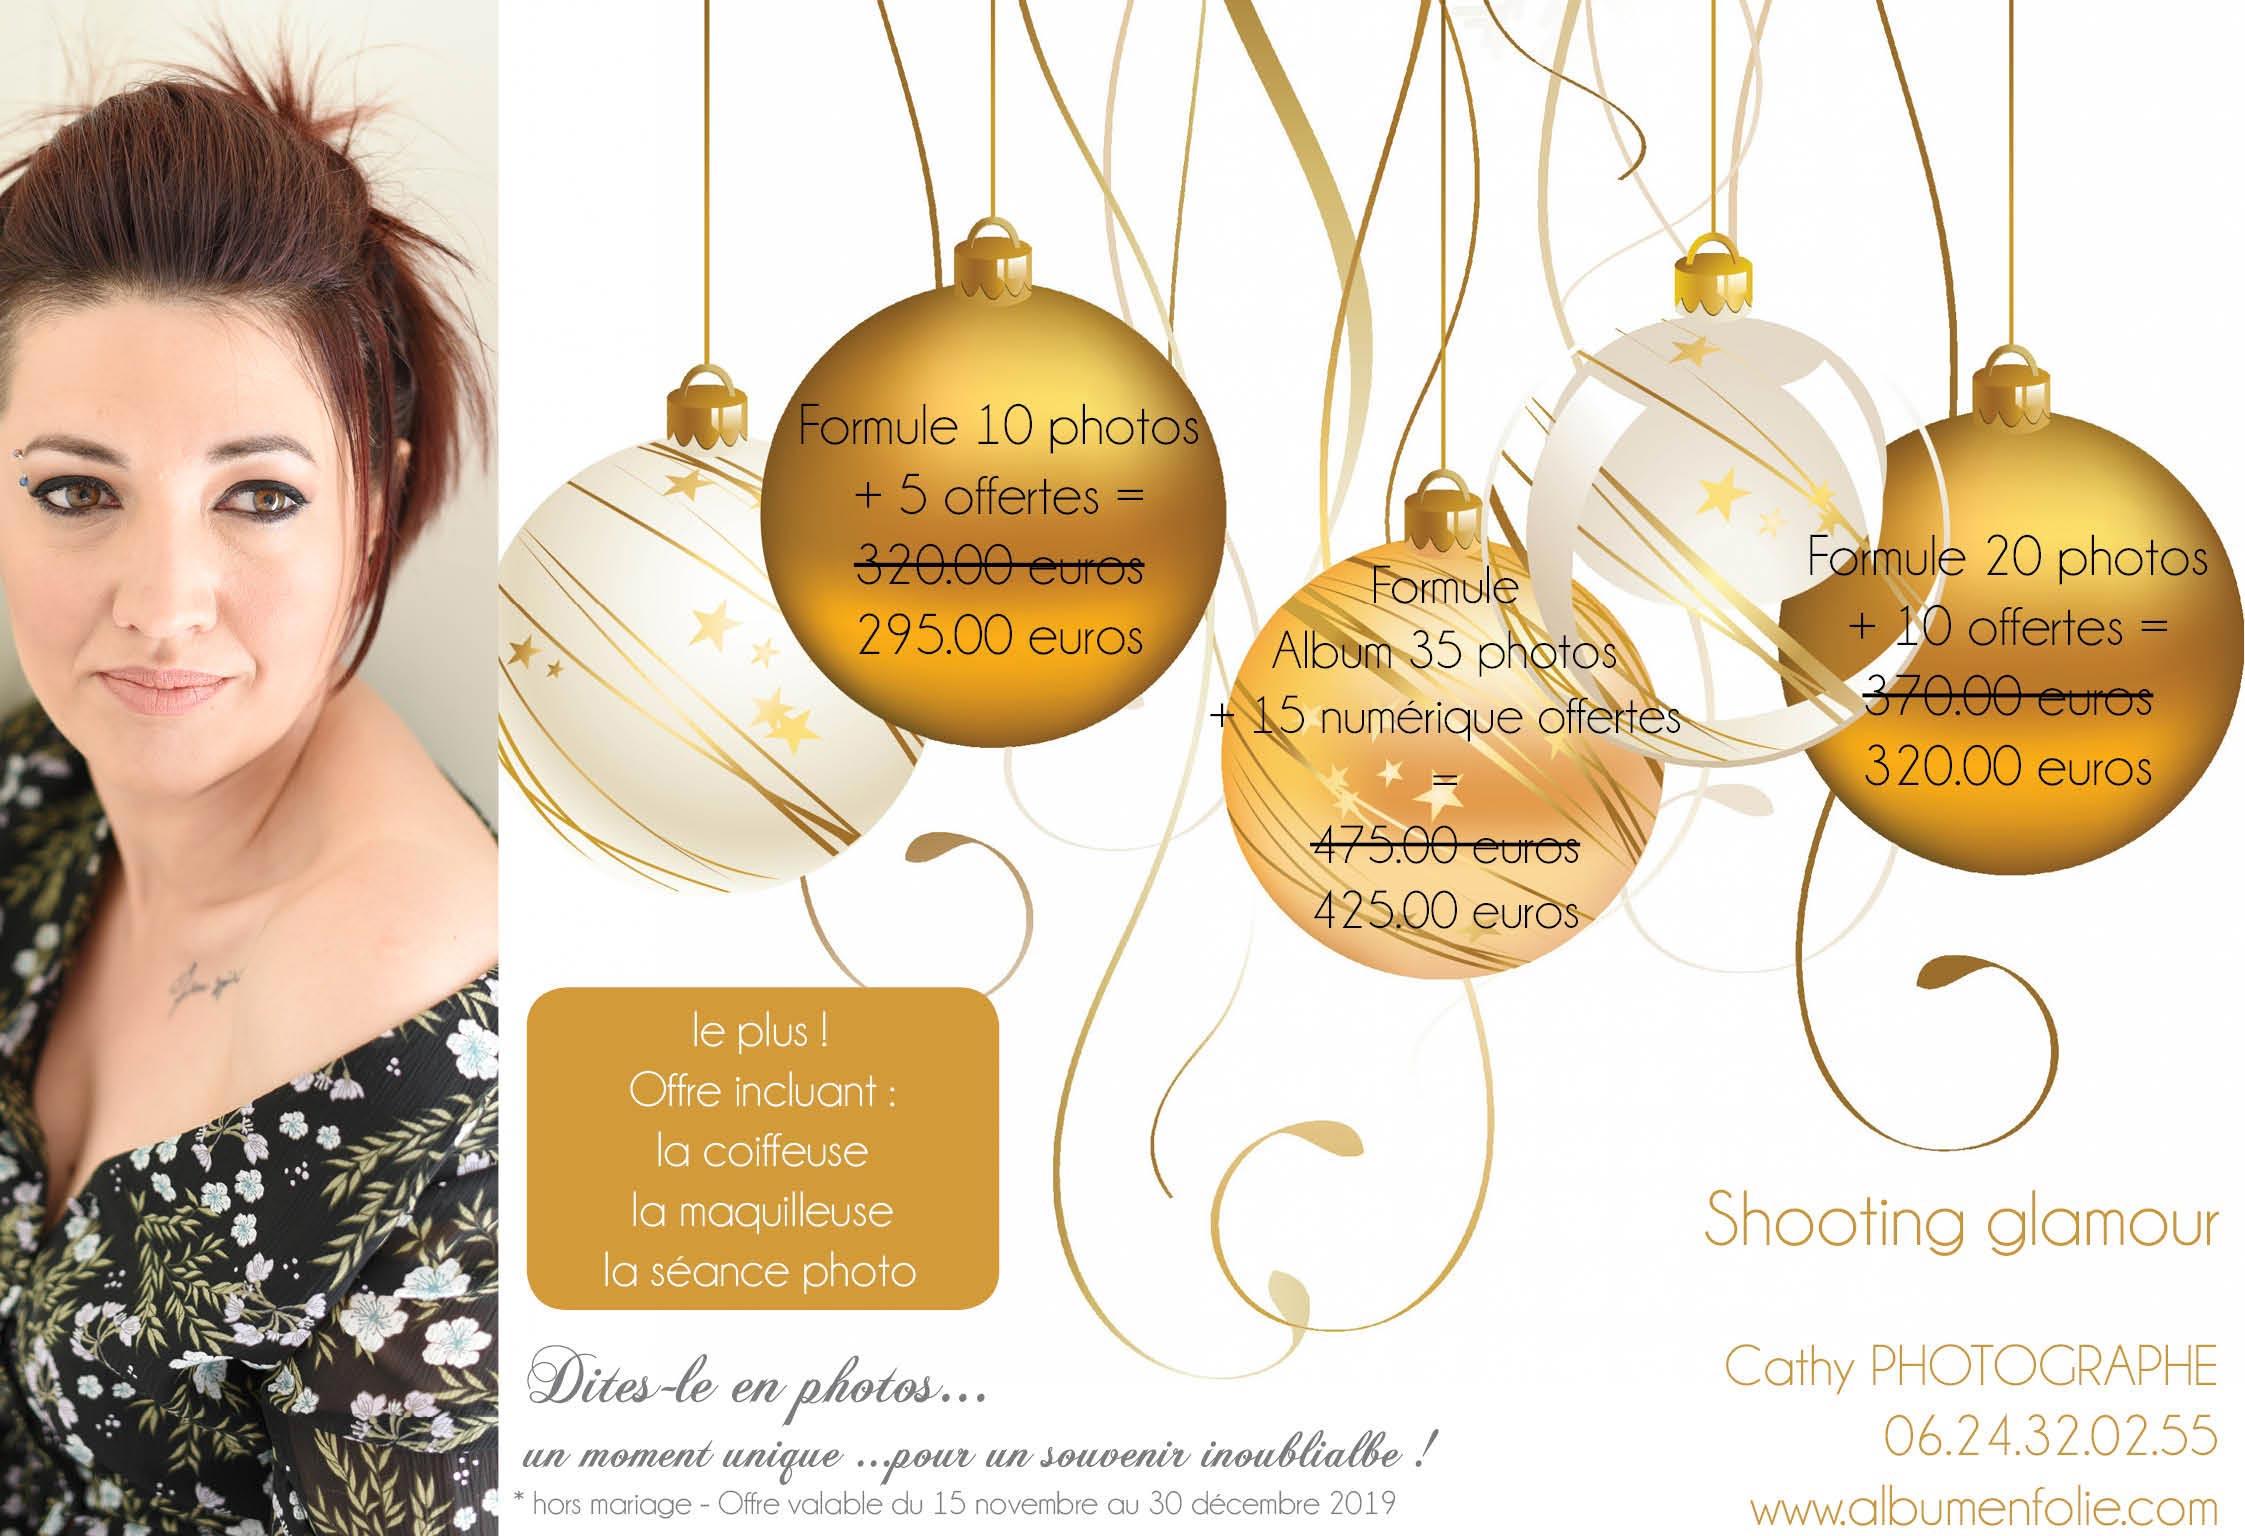 Offres de Noel glamour 2019